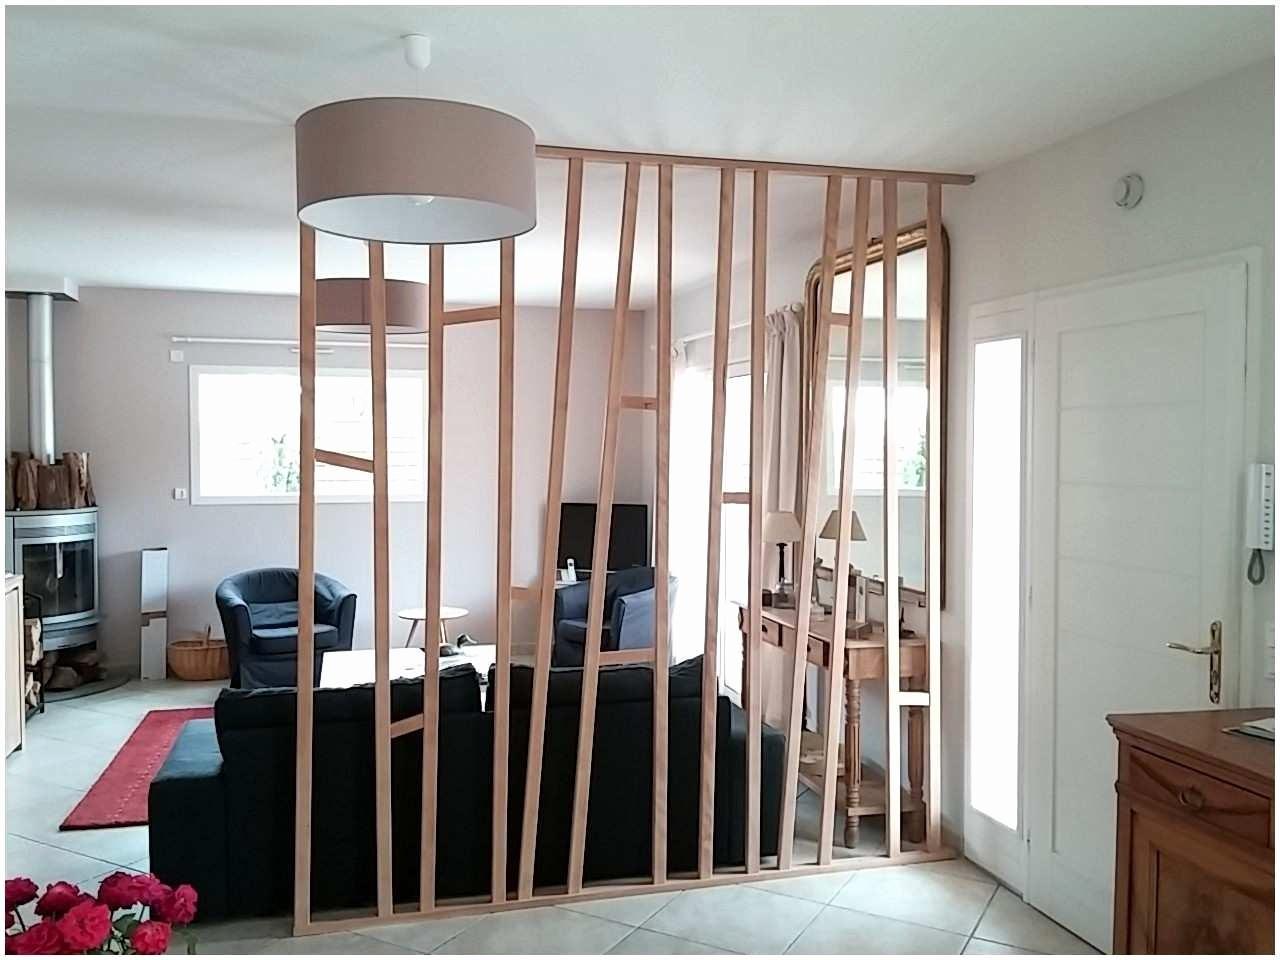 claustra decoration minimaliste entree salon